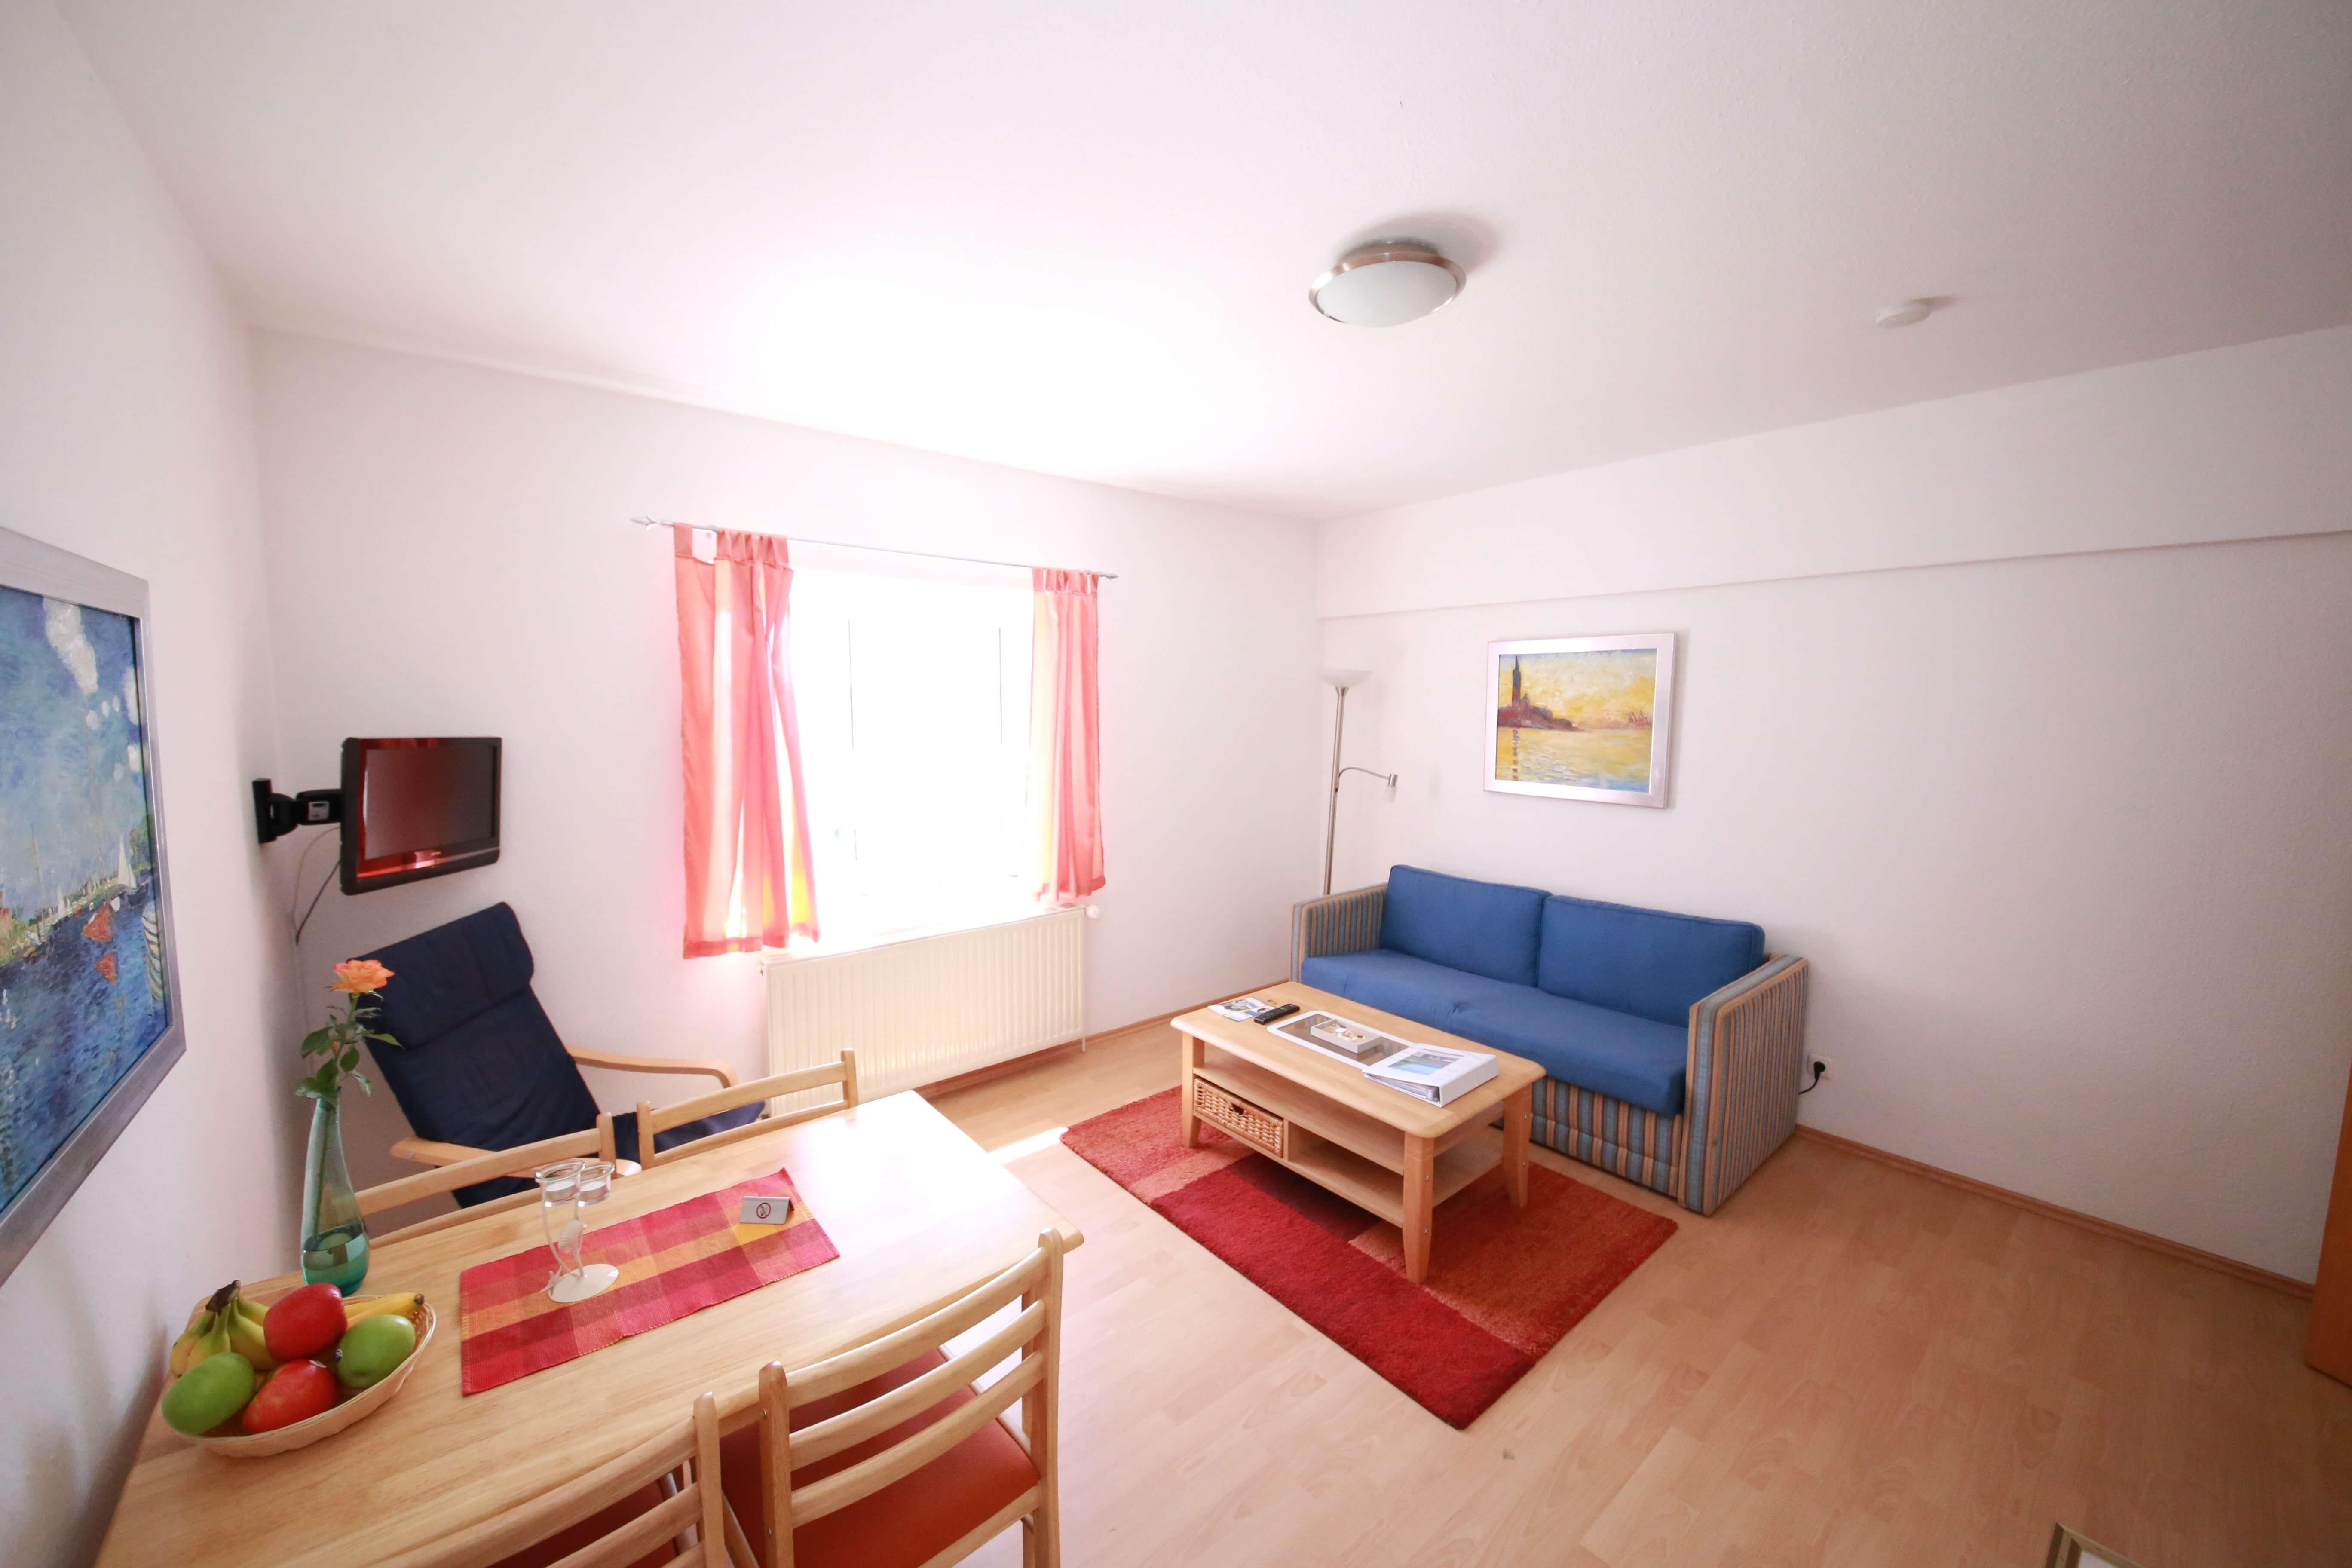 Apartment 4 4 personen apartmenthaus schleiblick for Kochen 4 personen